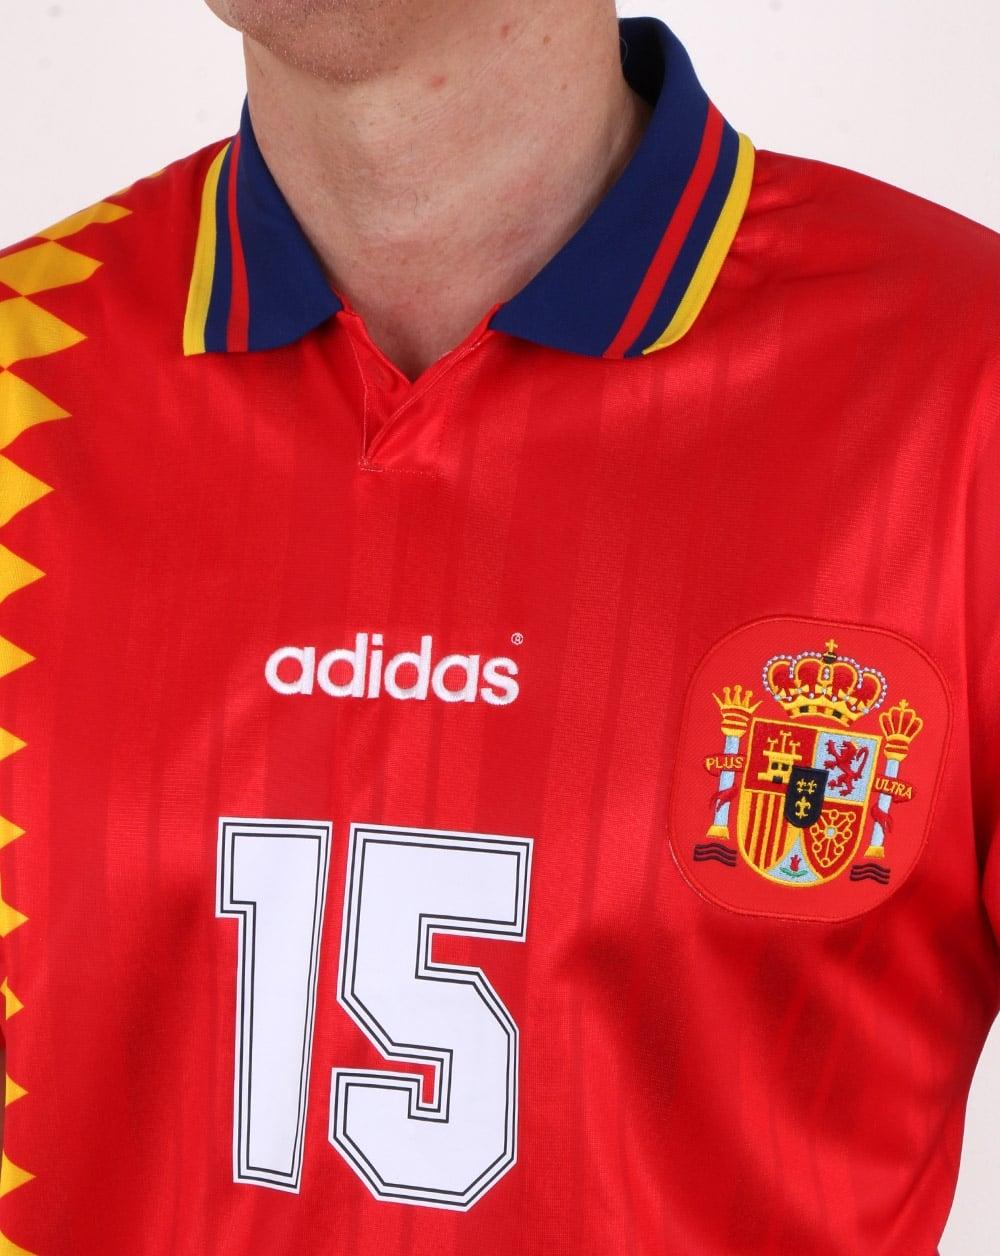 Adidas Originals Spain Jersey Red Mens Football World Cup 1994 Fashion Big Size T Shirt 3xl